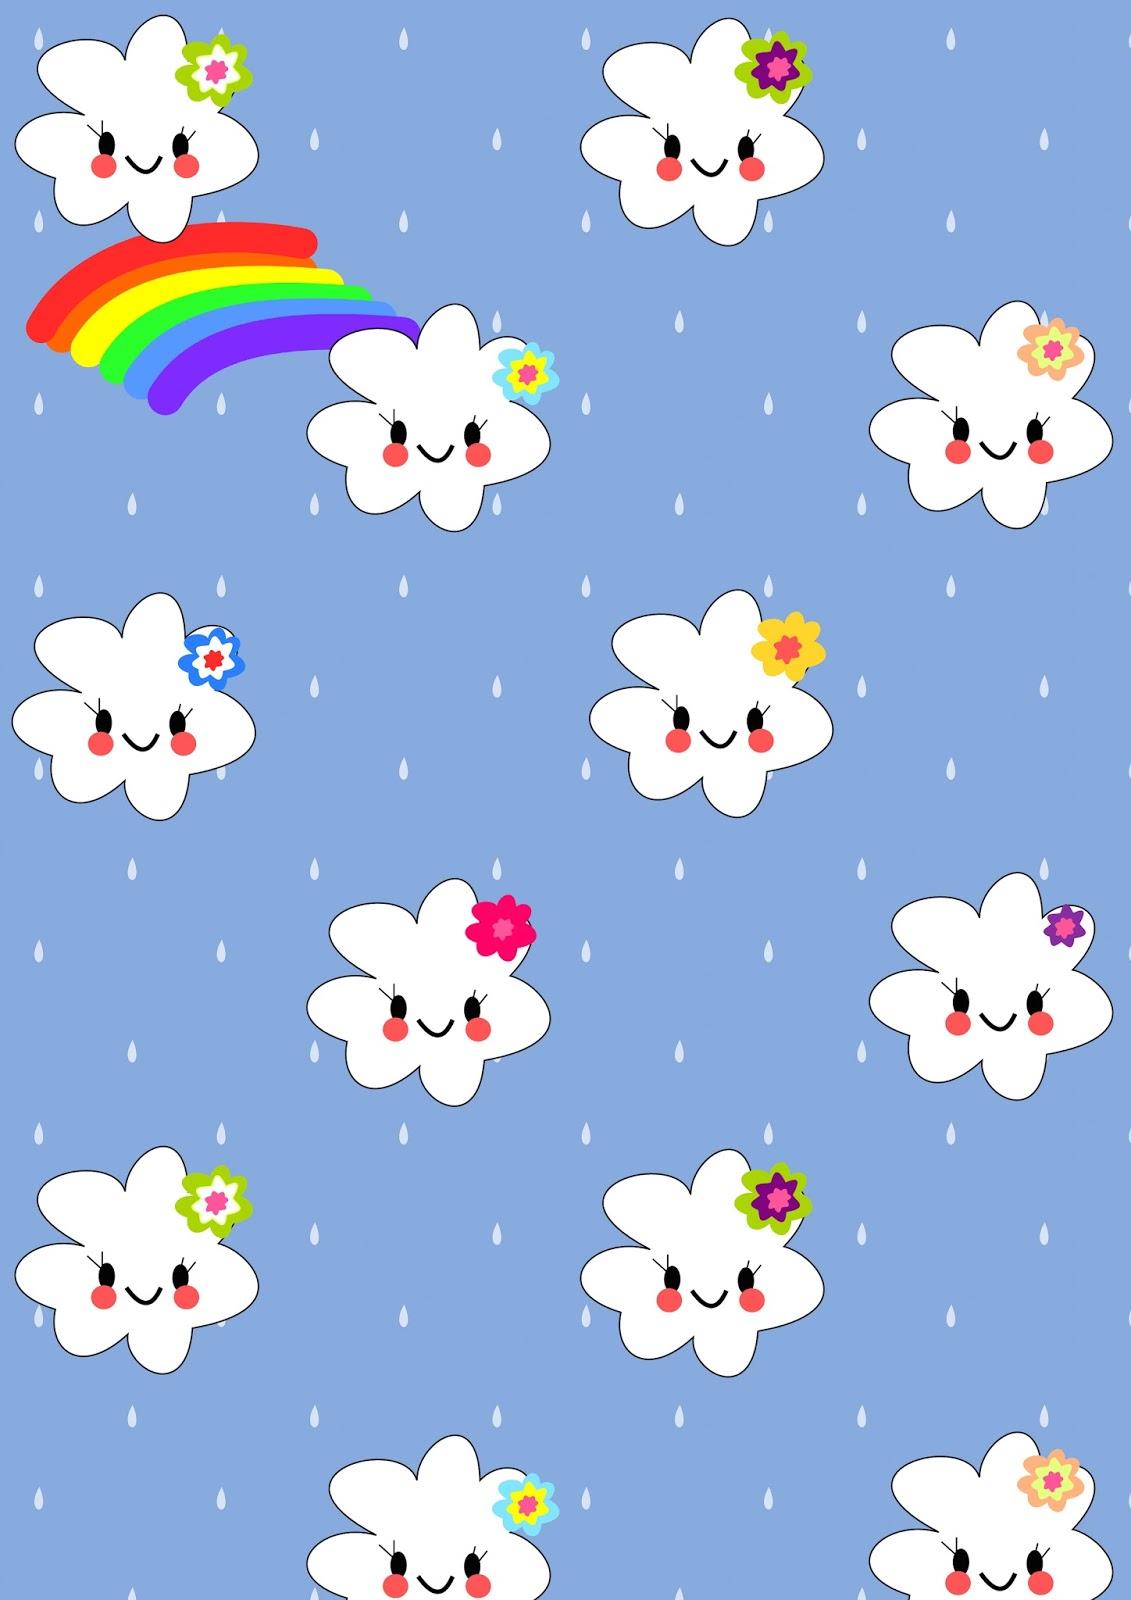 Scrapbook paper kawaii - Free Digital Kawaii Rainbow Scrapbooking Paper In Kawaii Style For Kids Freebie